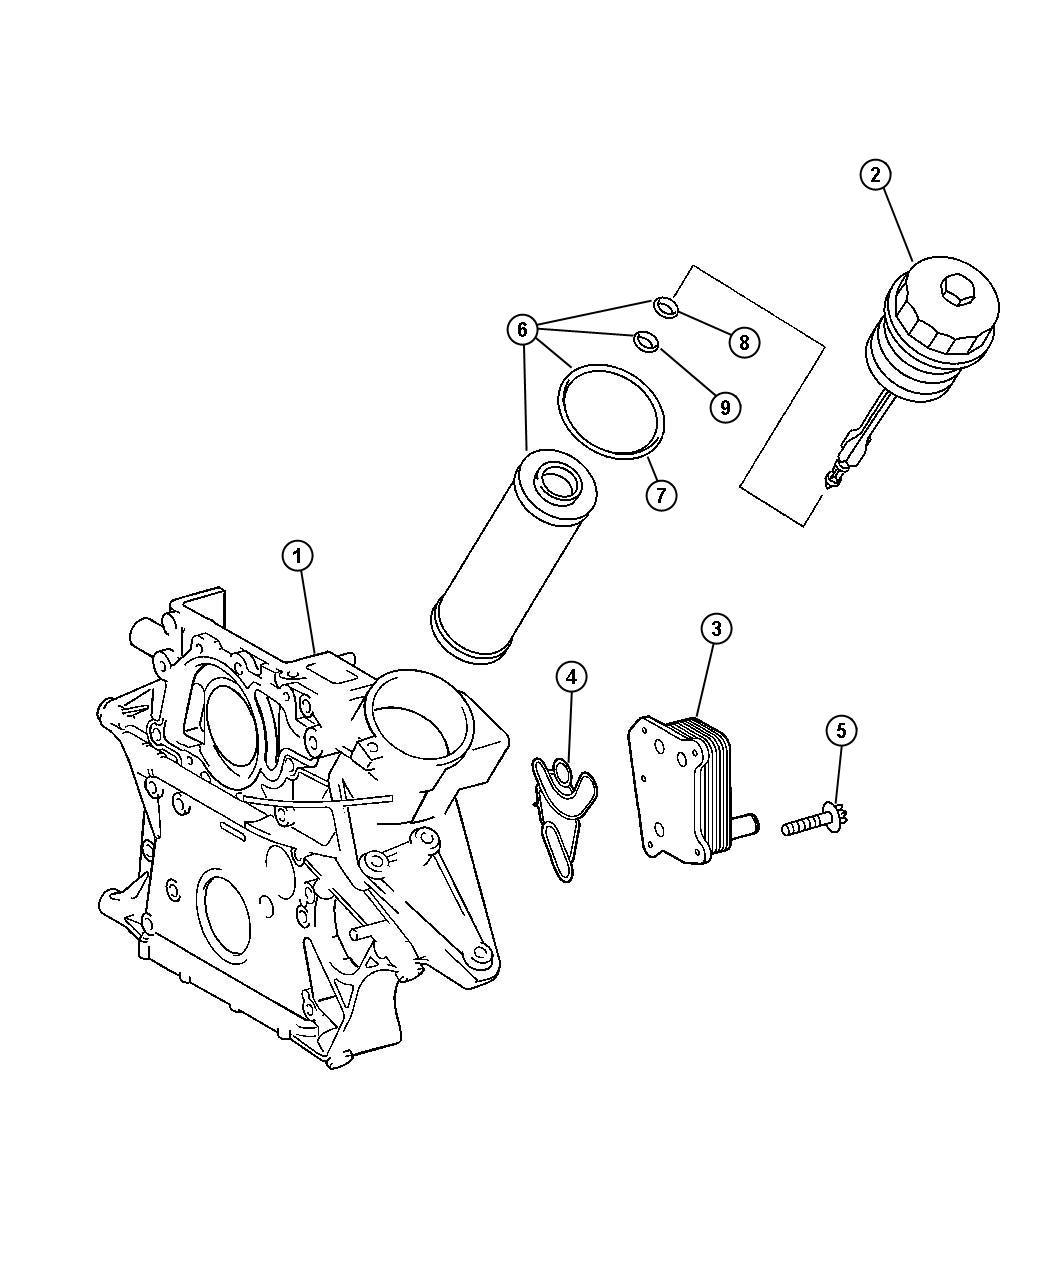 New Genuine Mopar 05086301AA Engine Oil Filter for Dodge Sprinter 2500 3500